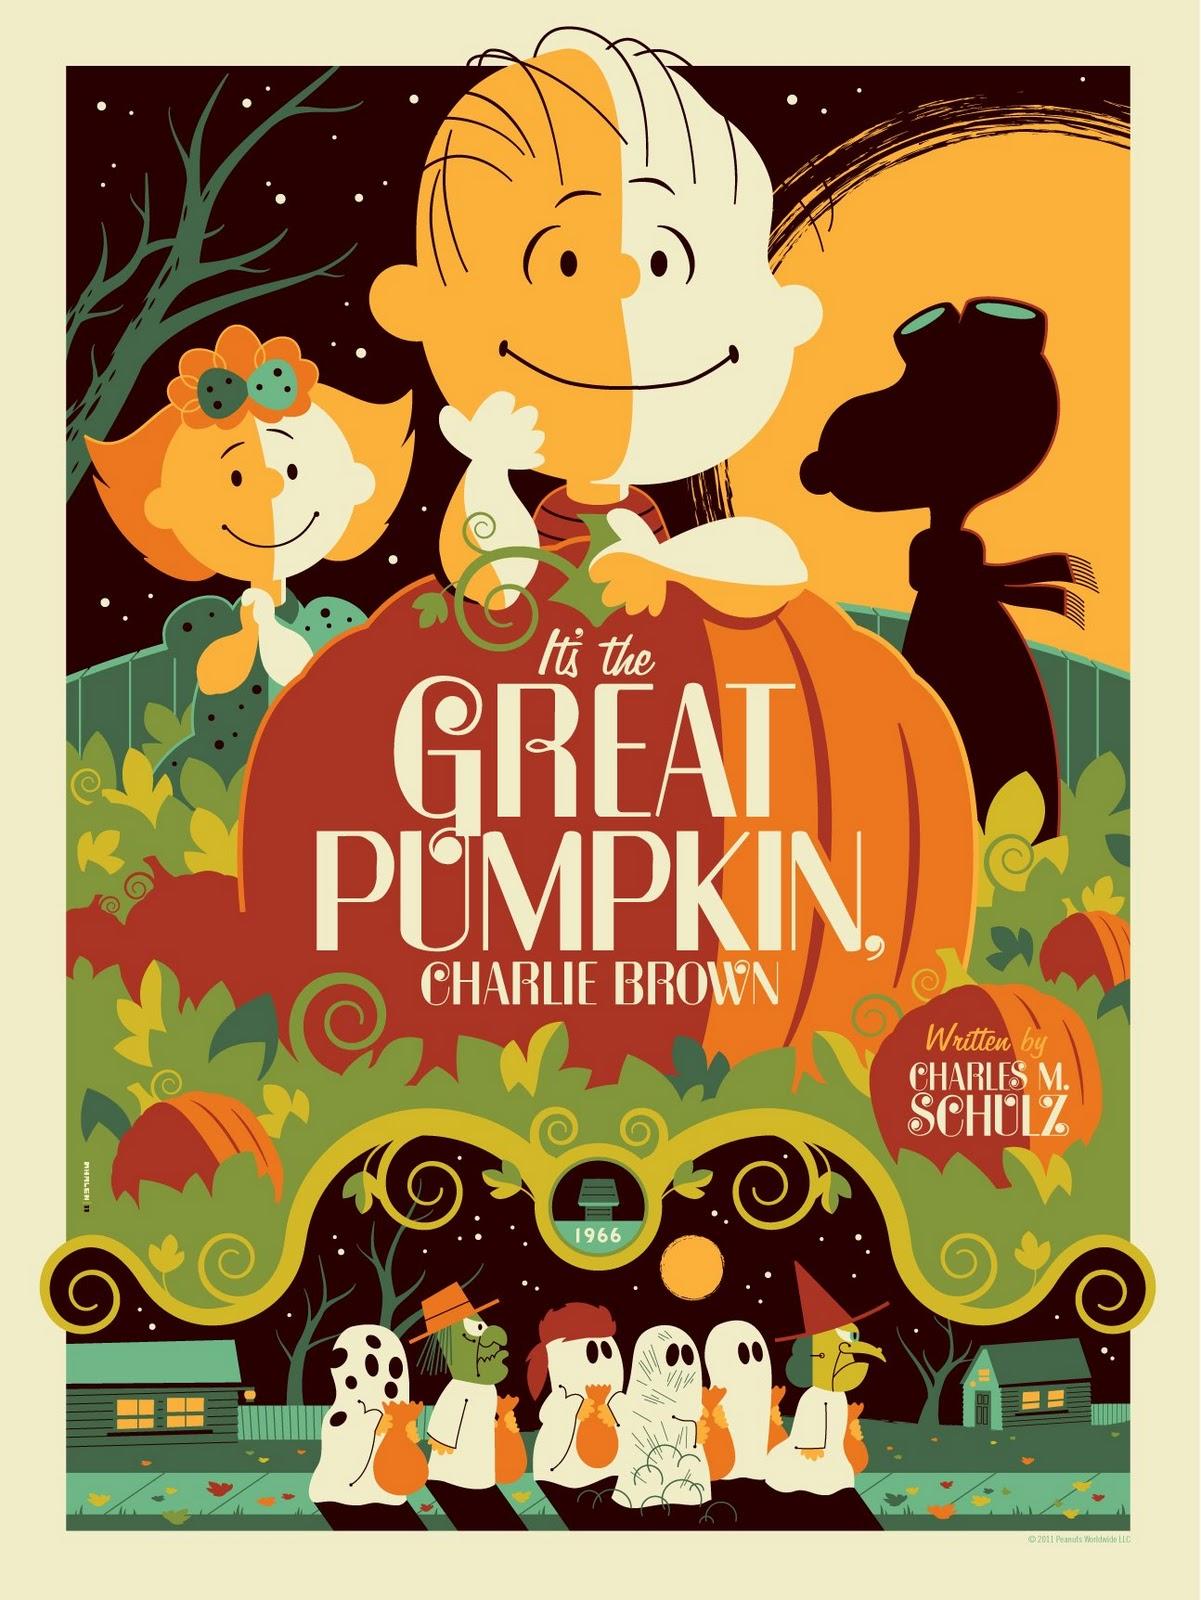 The Blot Says Peanuts It S The Great Pumpkin Charlie